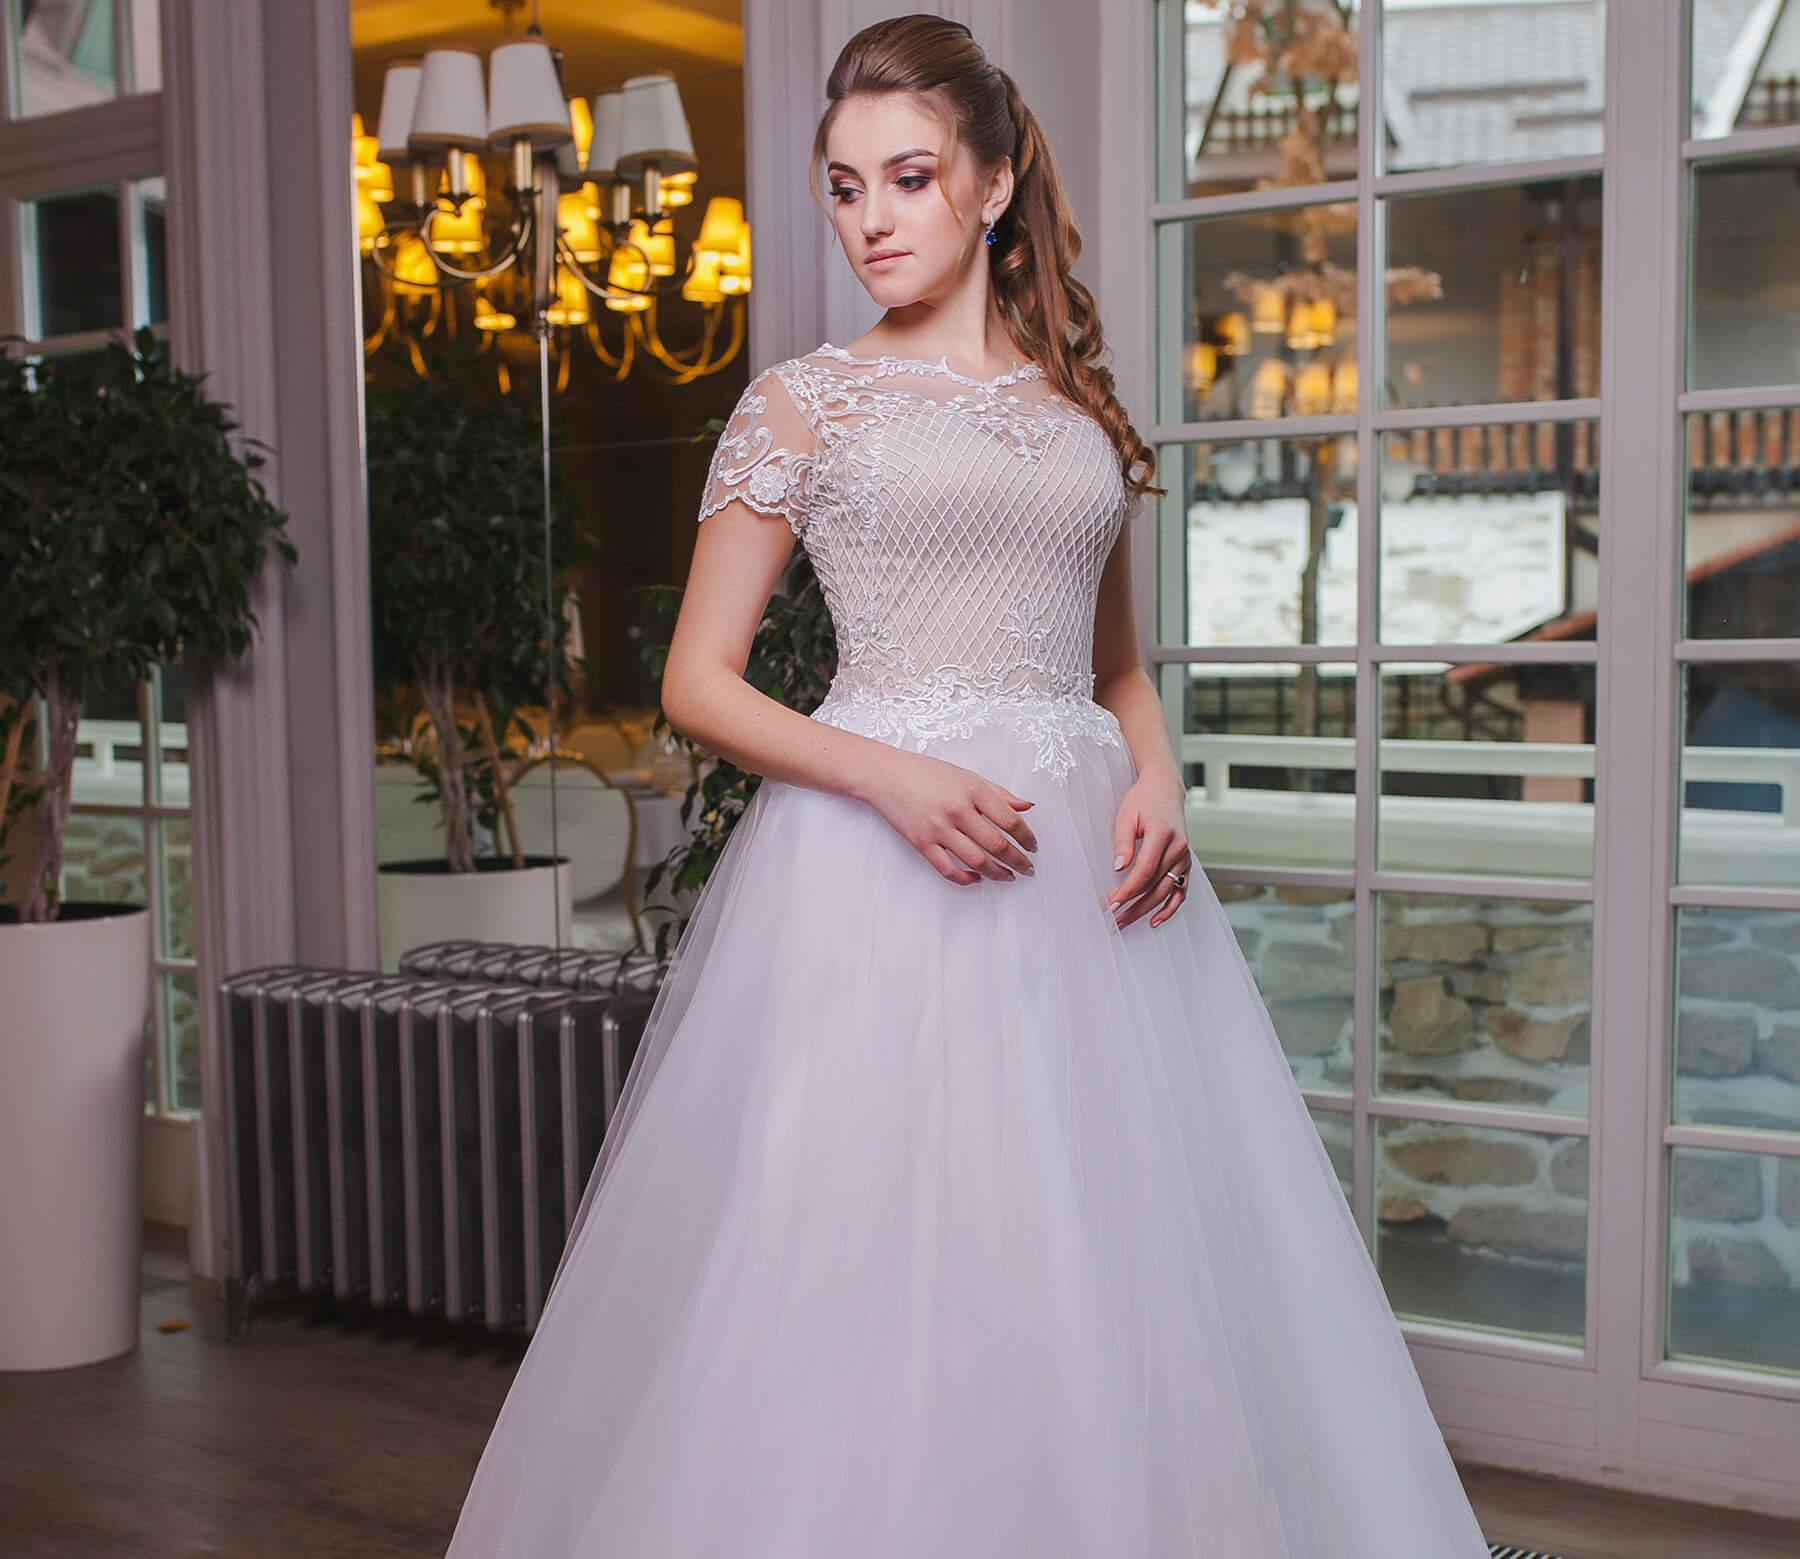 1cfed6f613a6 Пышные свадебные платья  http   svadbagarderob.ru wp-content uploads 2018